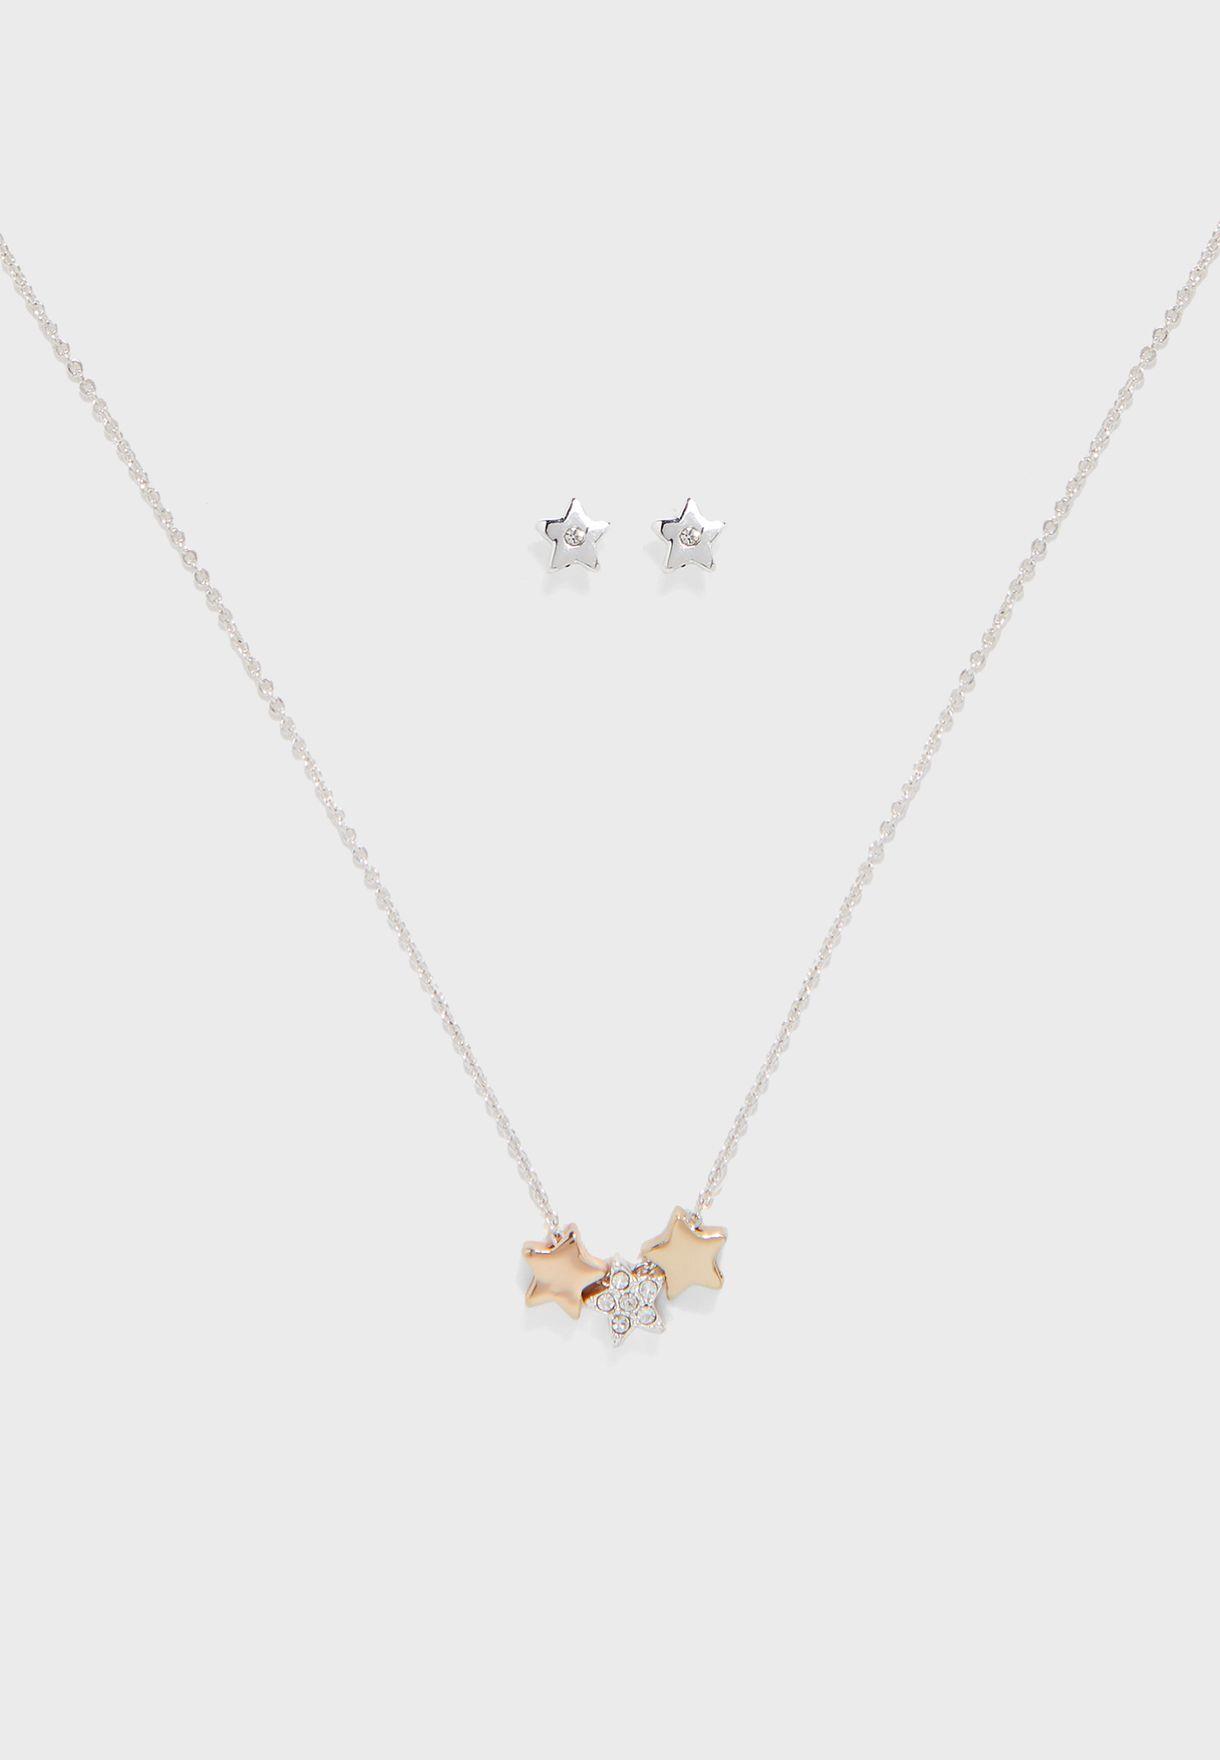 Starburst Necklace+Earring Set